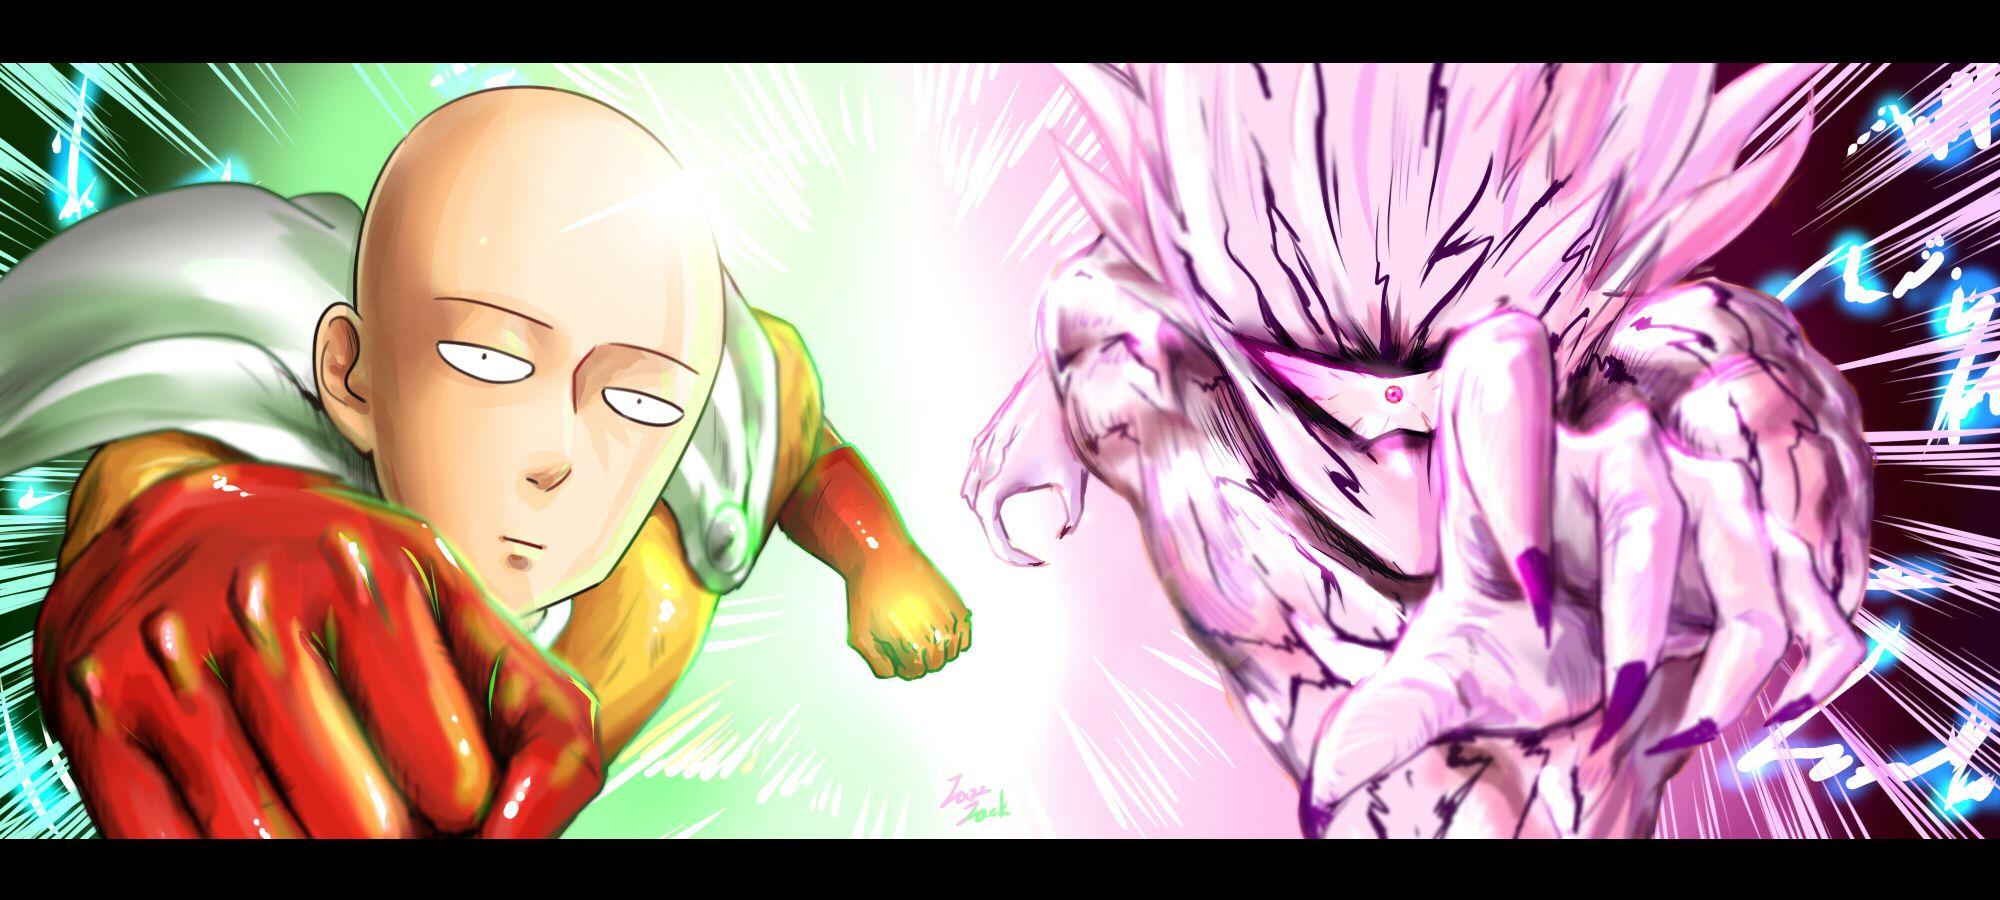 Anime One Punch Man Saitama Lord Boros Wallpaper One Punch